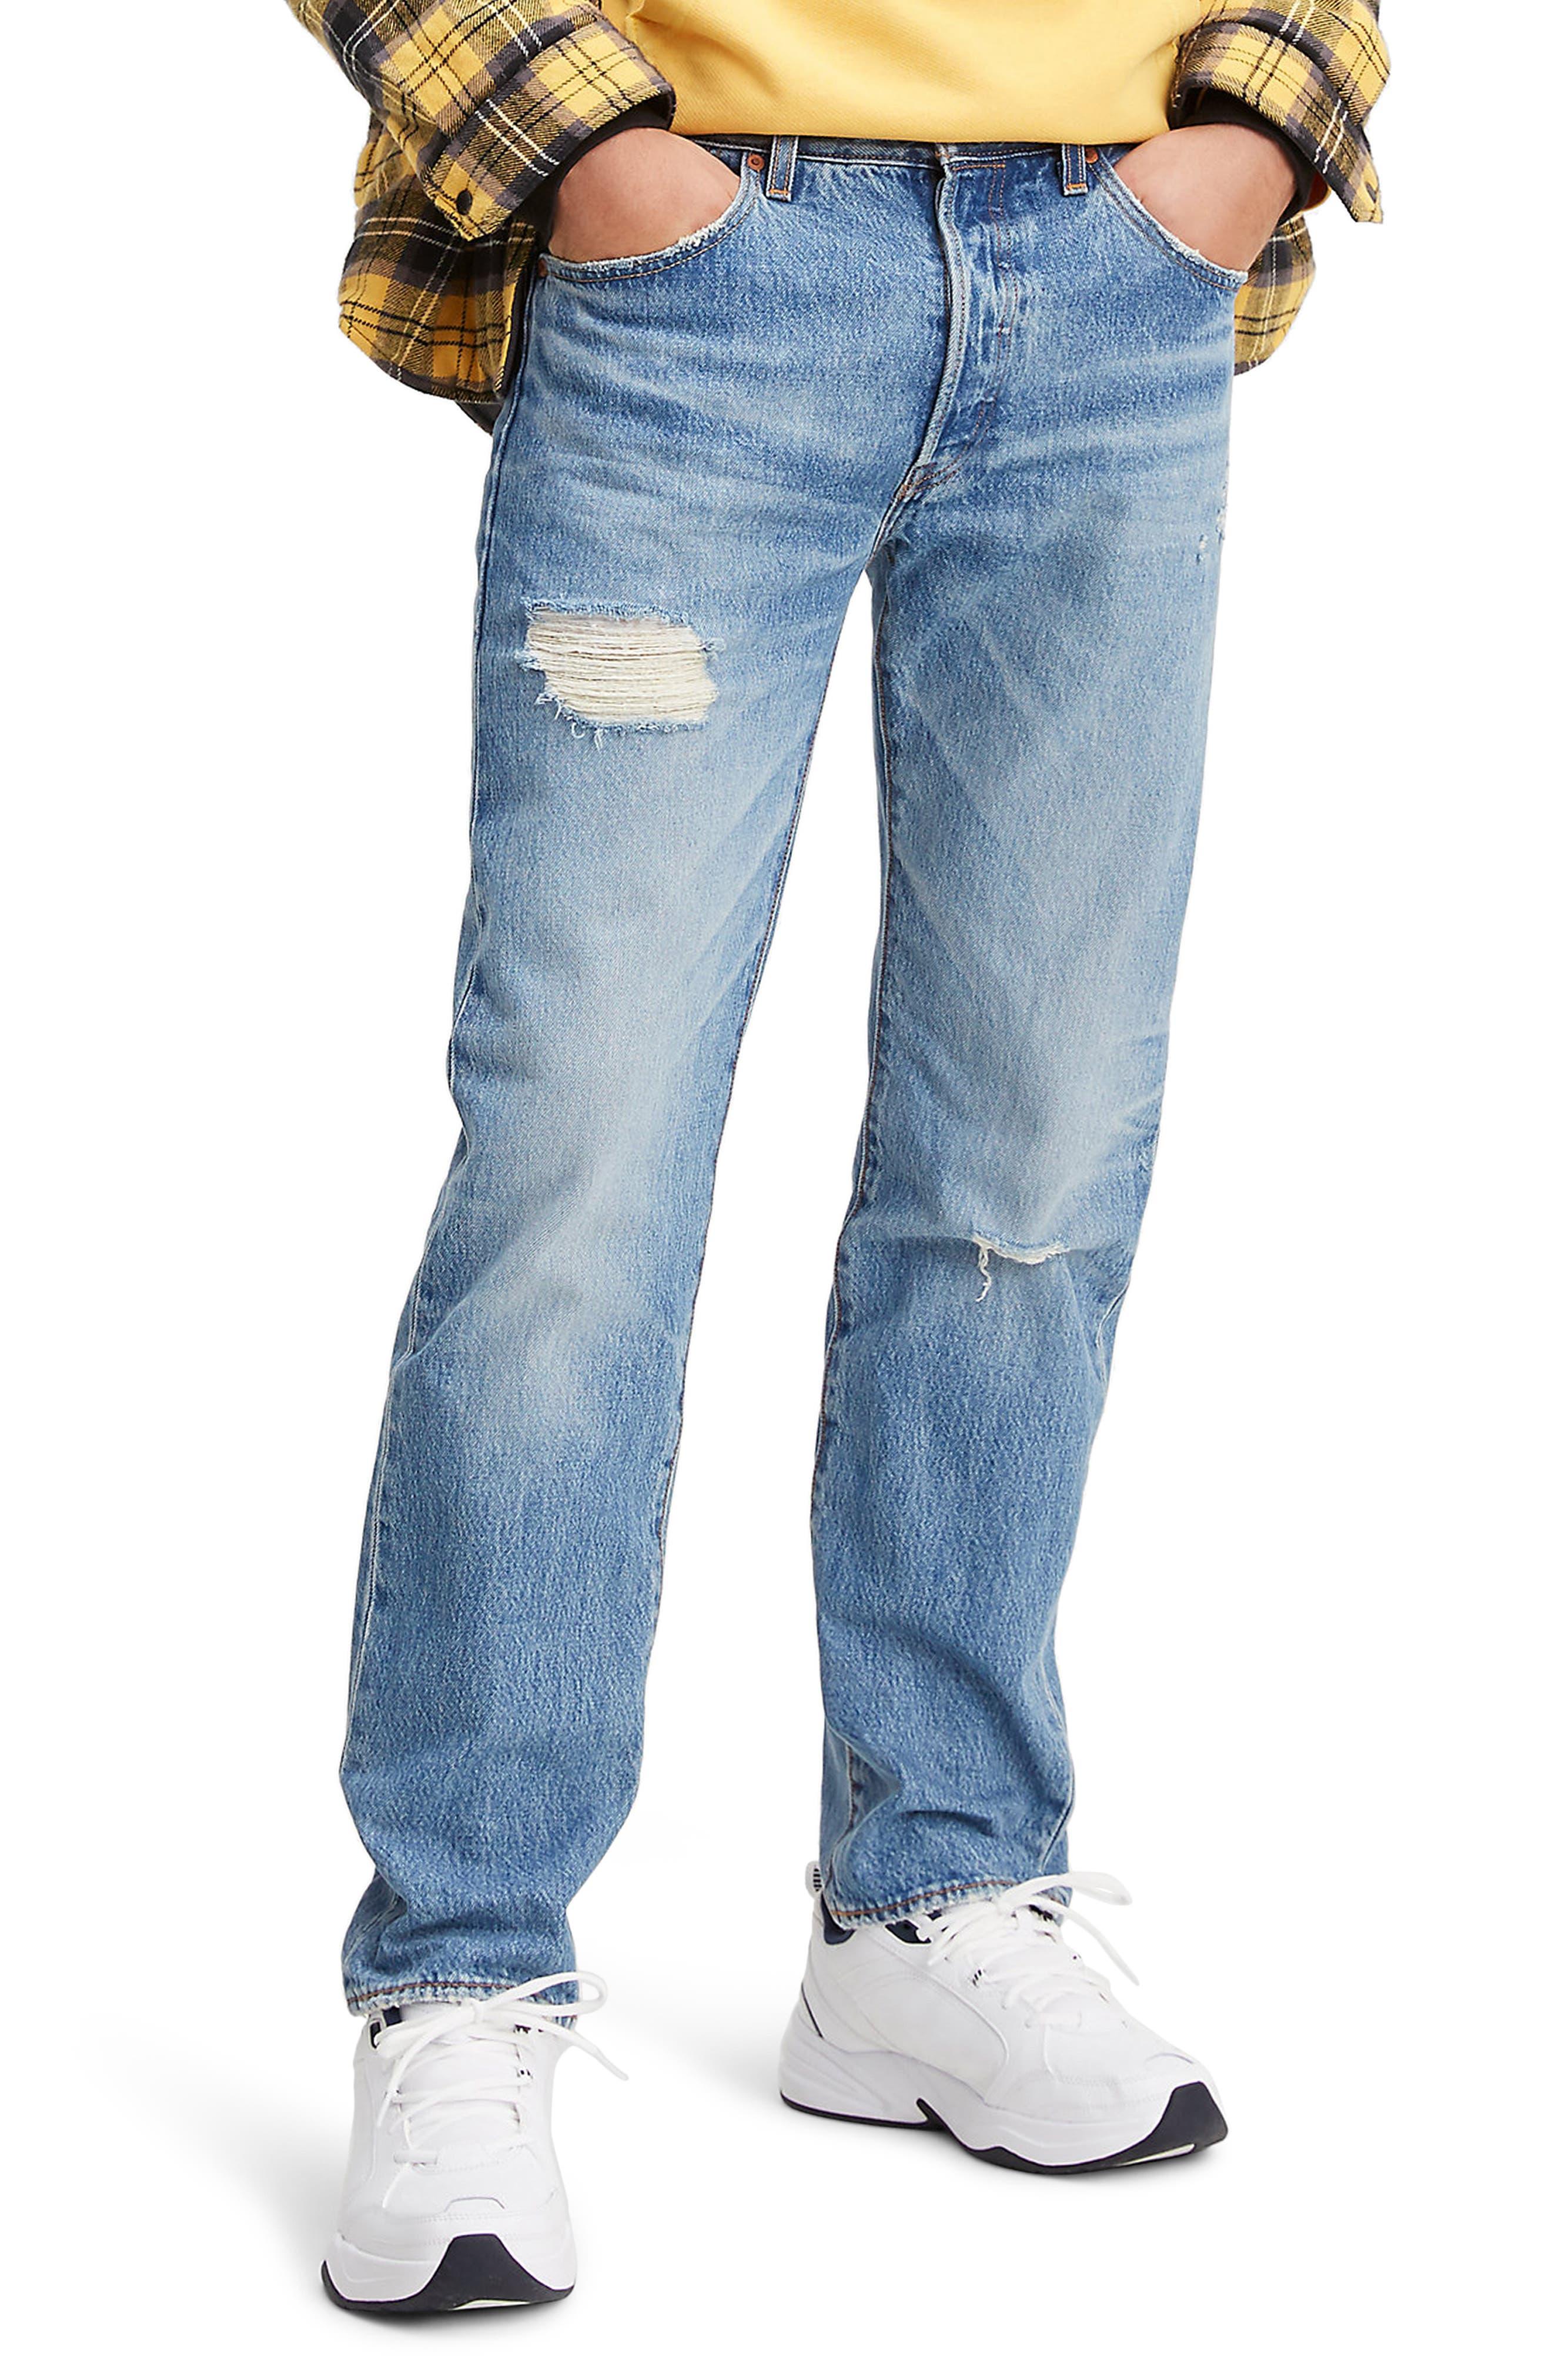 Men's Levi's 501 '93 Ripped Straight Leg Jeans,  29 x 32 - Blue